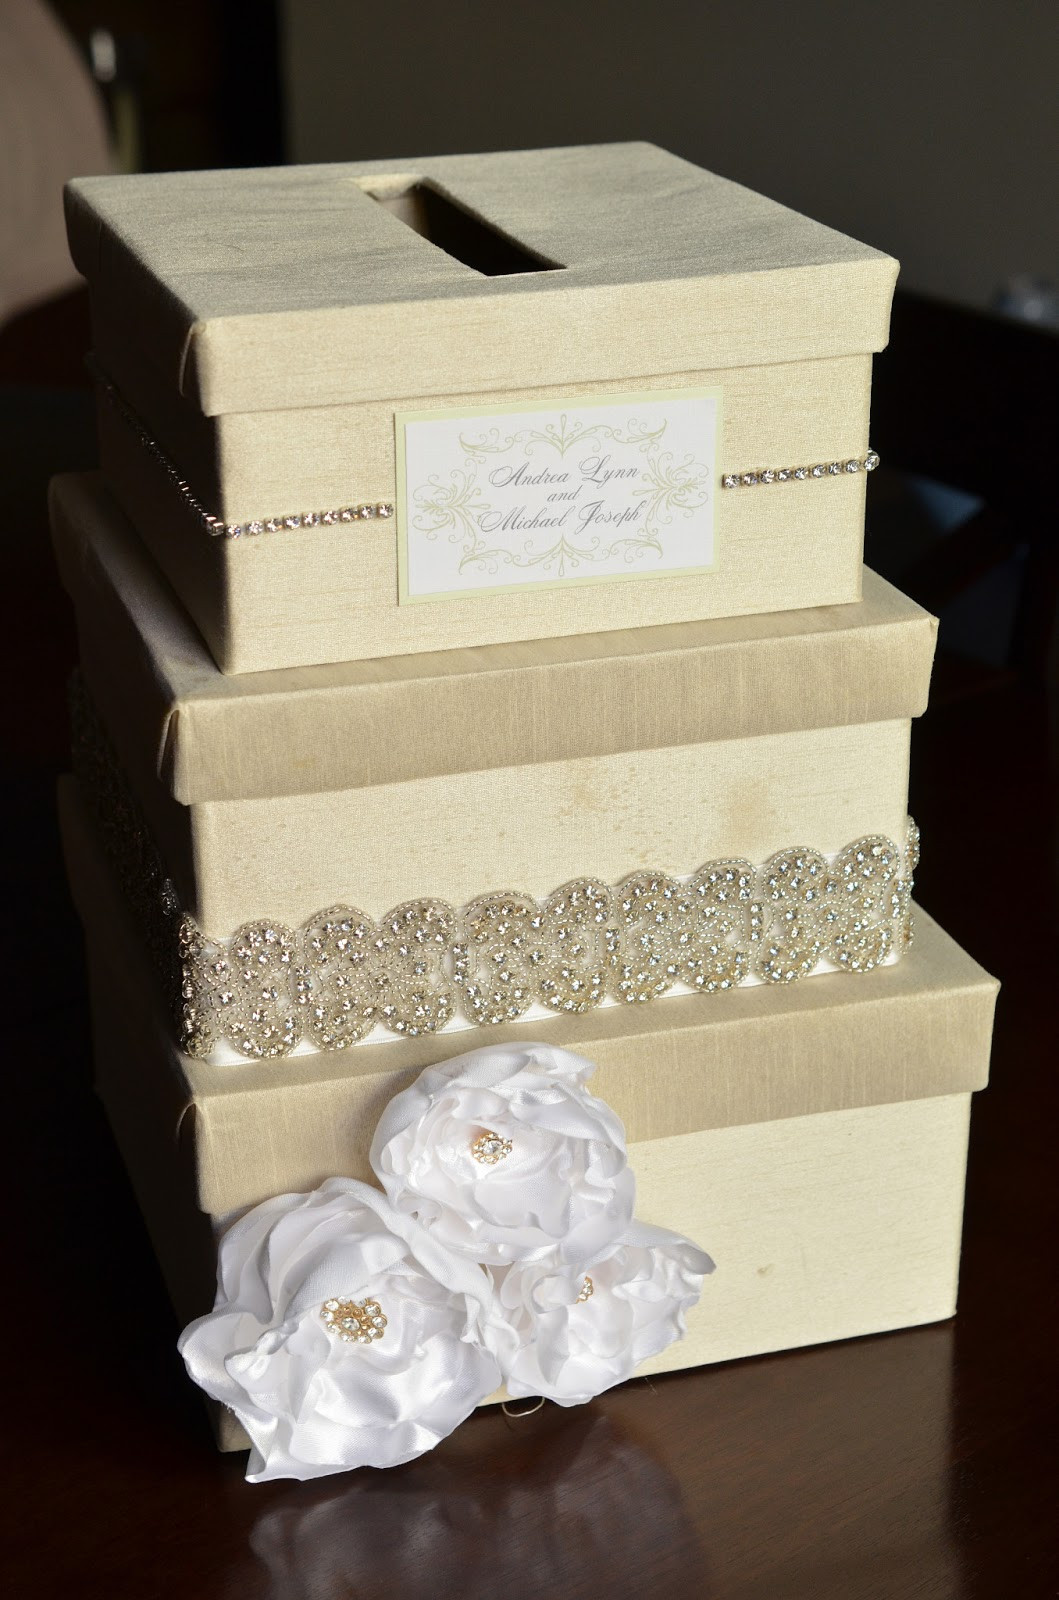 Best ideas about Wedding Card Box DIY . Save or Pin DIY Wedding Card Box Tutorial Andrea Lynn HANDMADE Now.